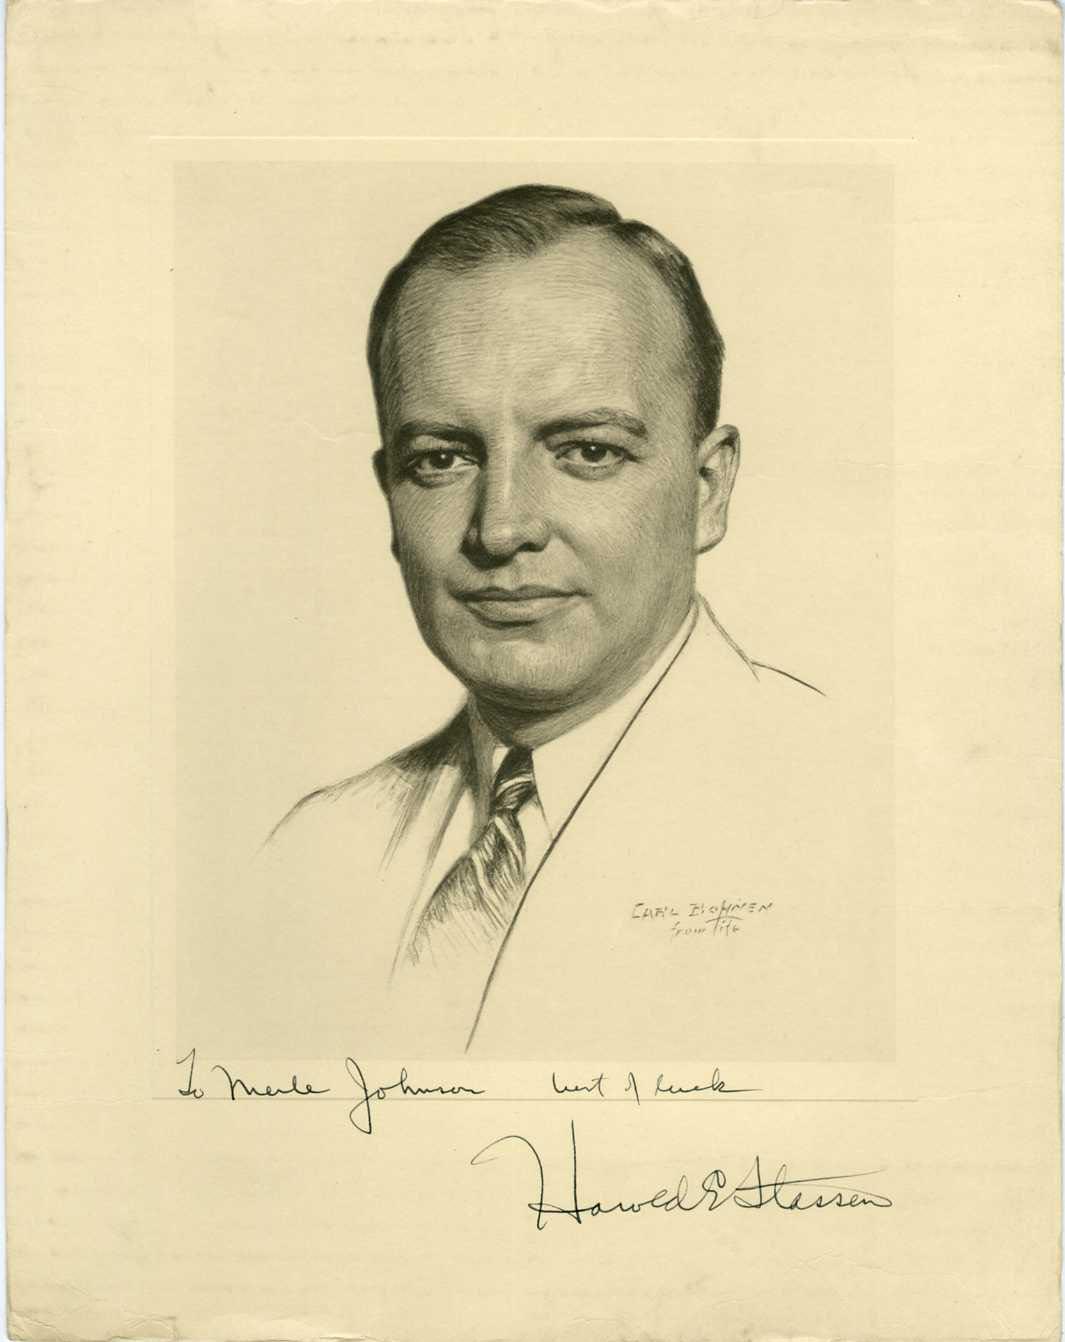 HAROLD E. STASSEN (GOVERNOR OF MINNESOTA) -SIGNED POLITICAL PRINTED PHOTO c1940s